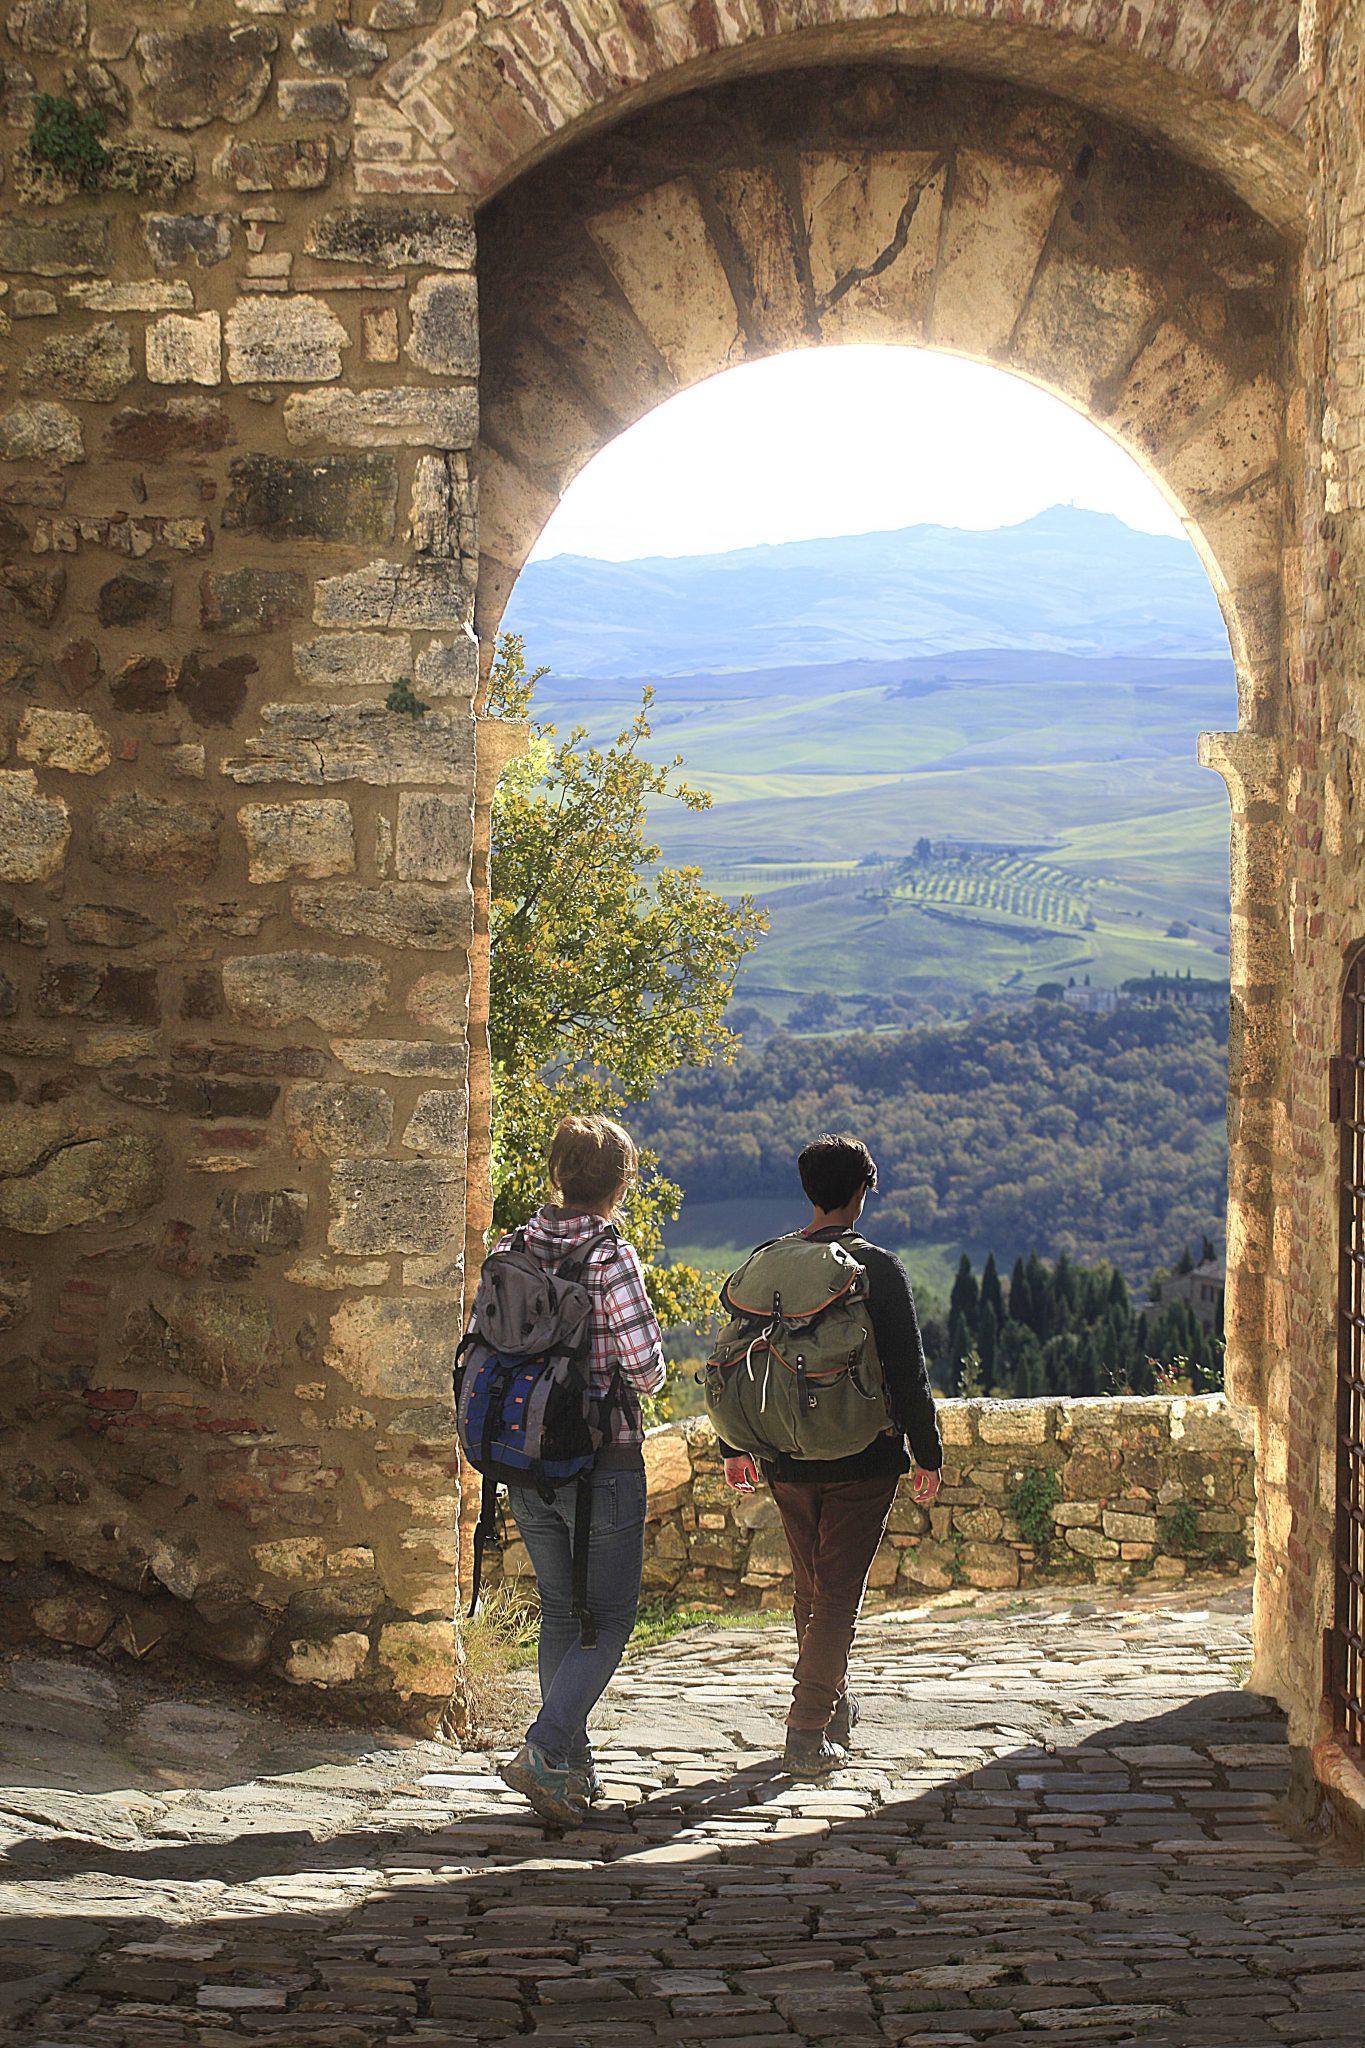 Toscana sconosciuta. Le mete alternative per l'estate 2018